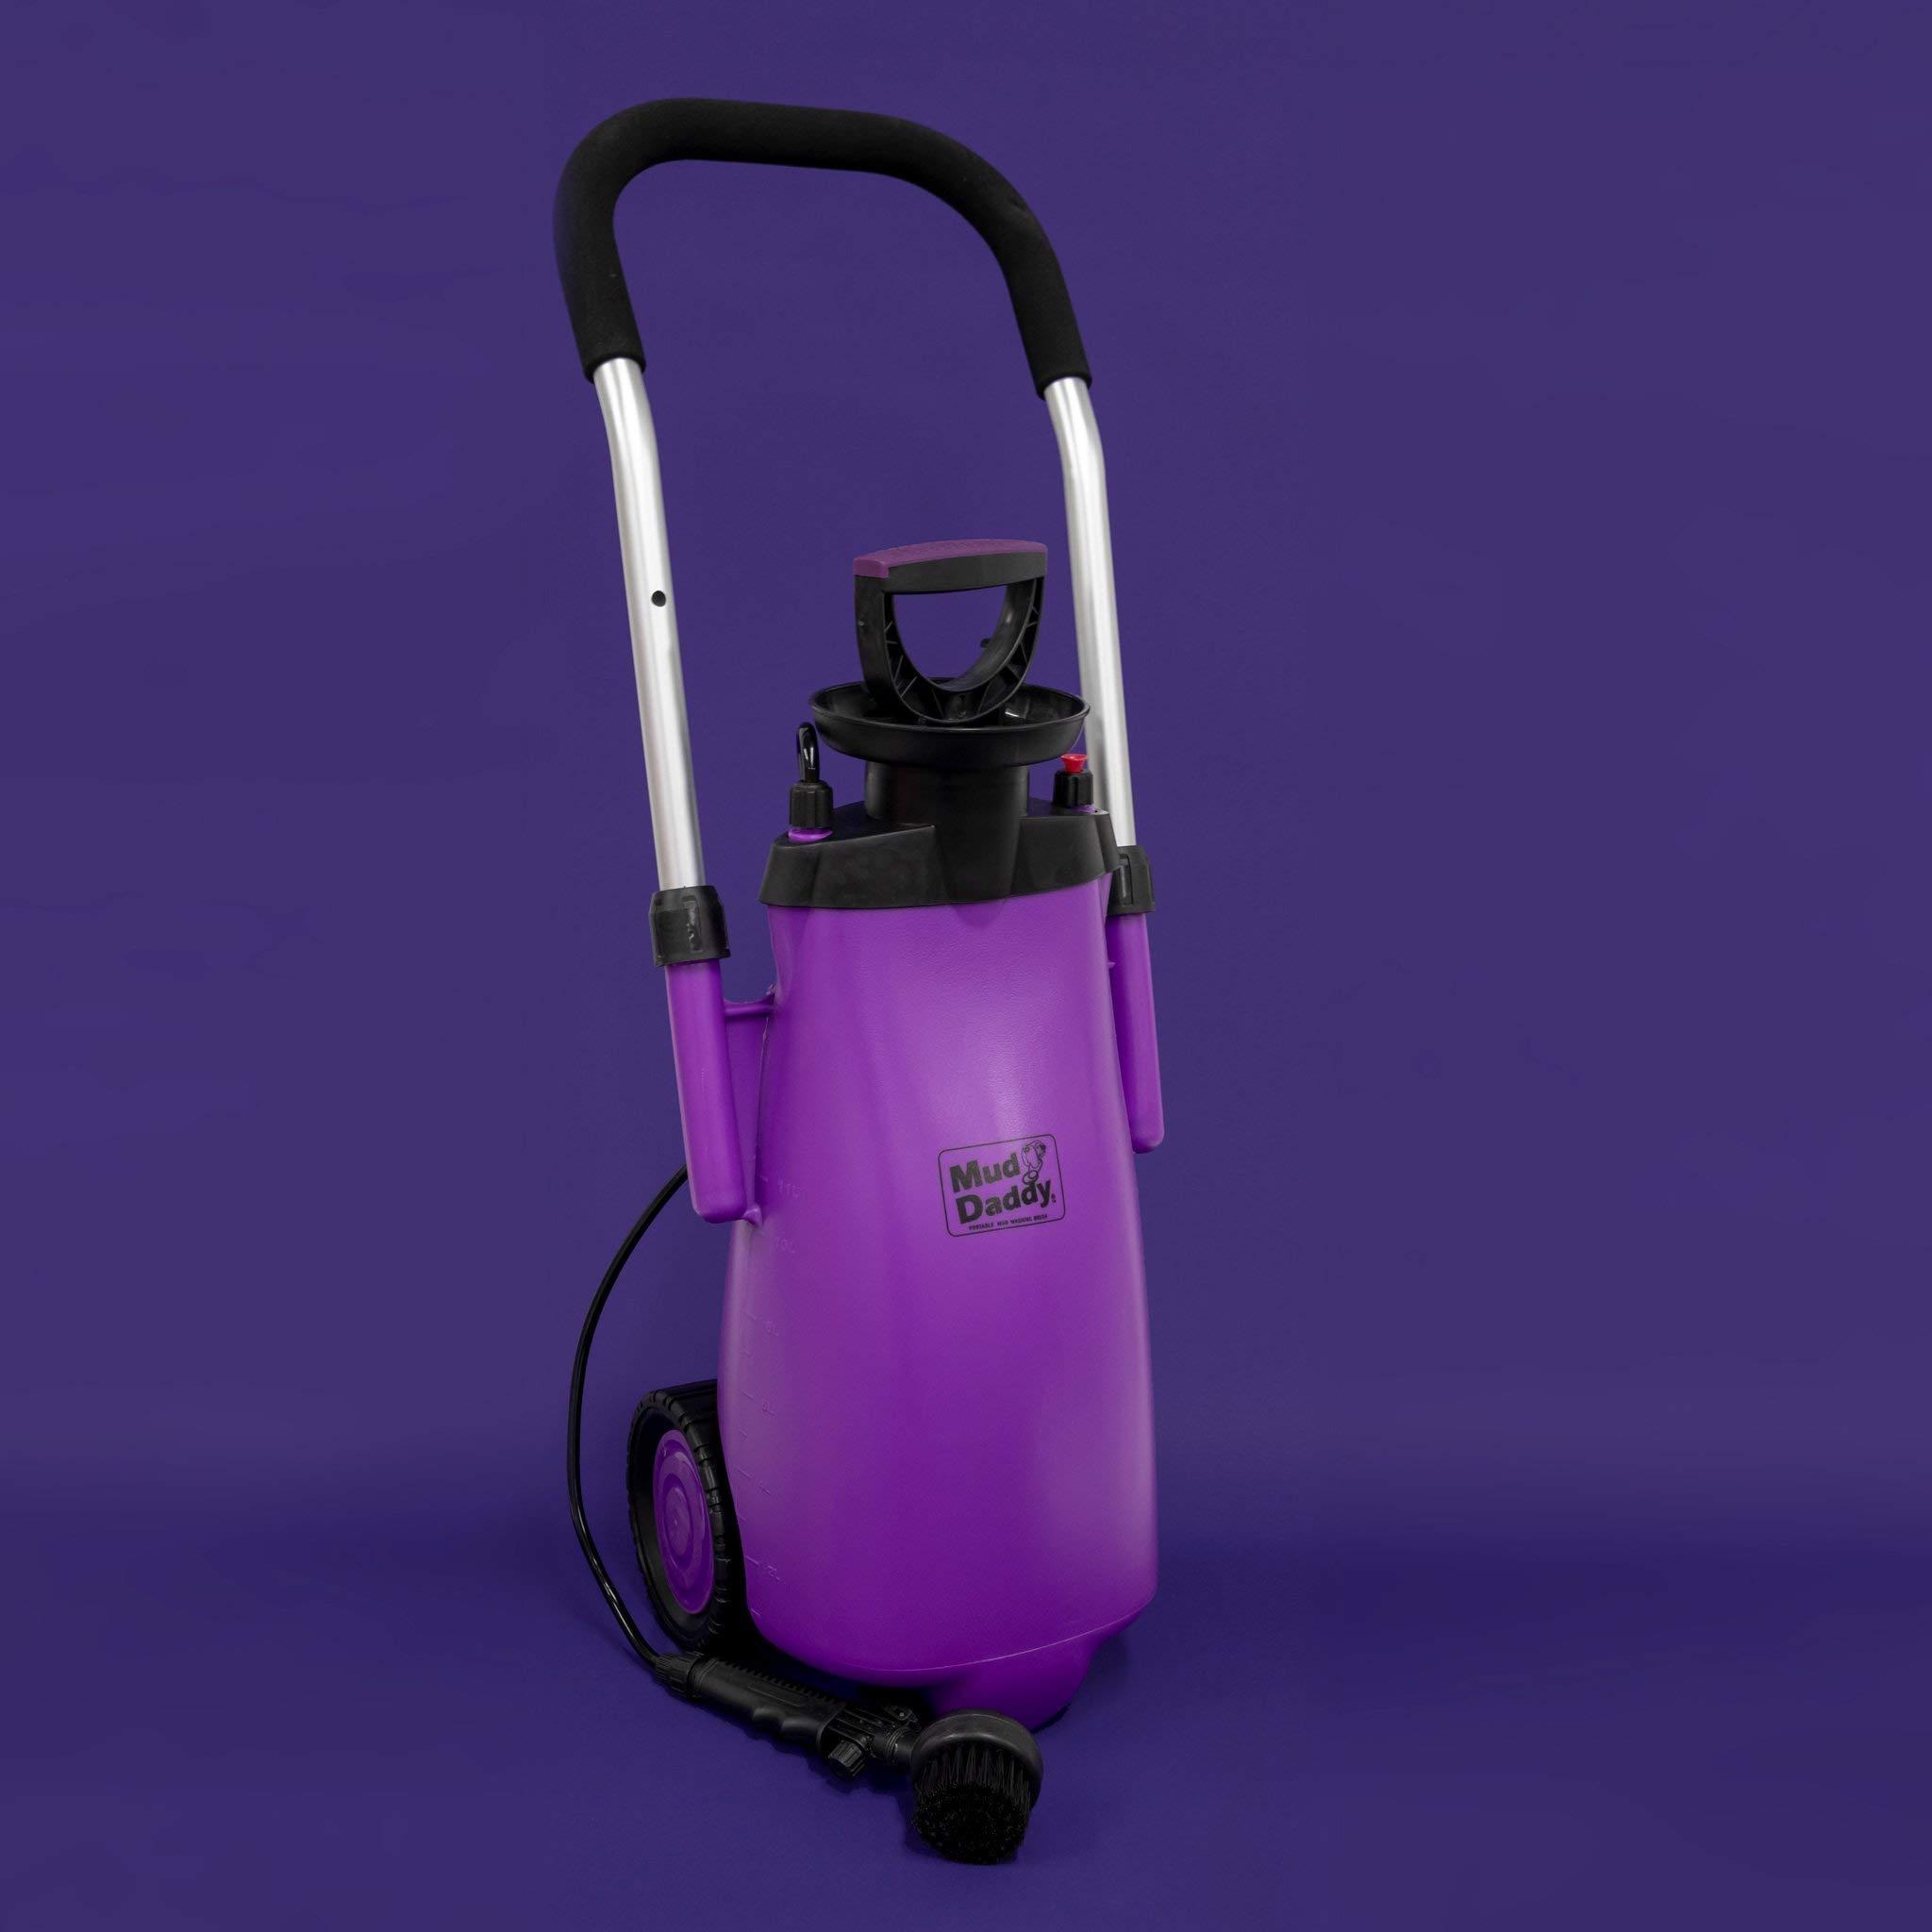 Mud Daddy Heavy Duty Washing Device on Wheels for Horses, Gardening, Camper (Purple)